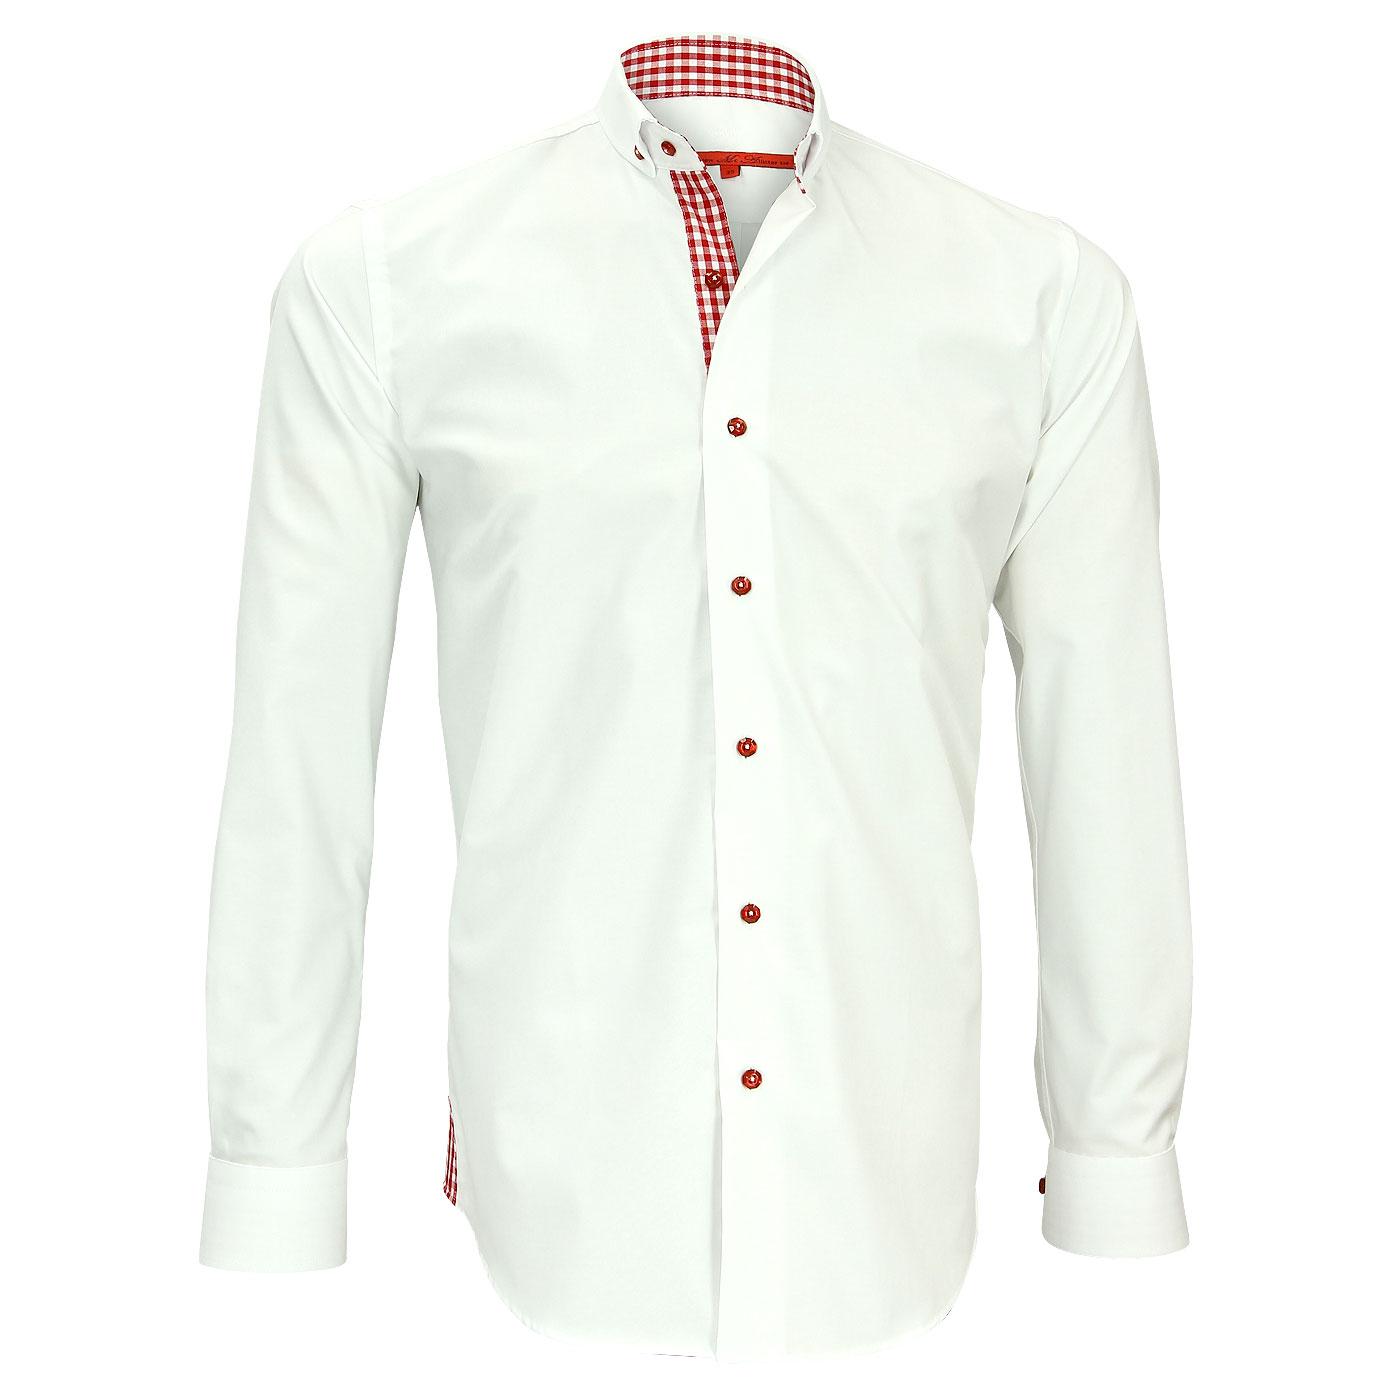 Chemise italienne coupe soign e et tissu haut de gamme - Chemise homme fashion coupe italienne cintree ...